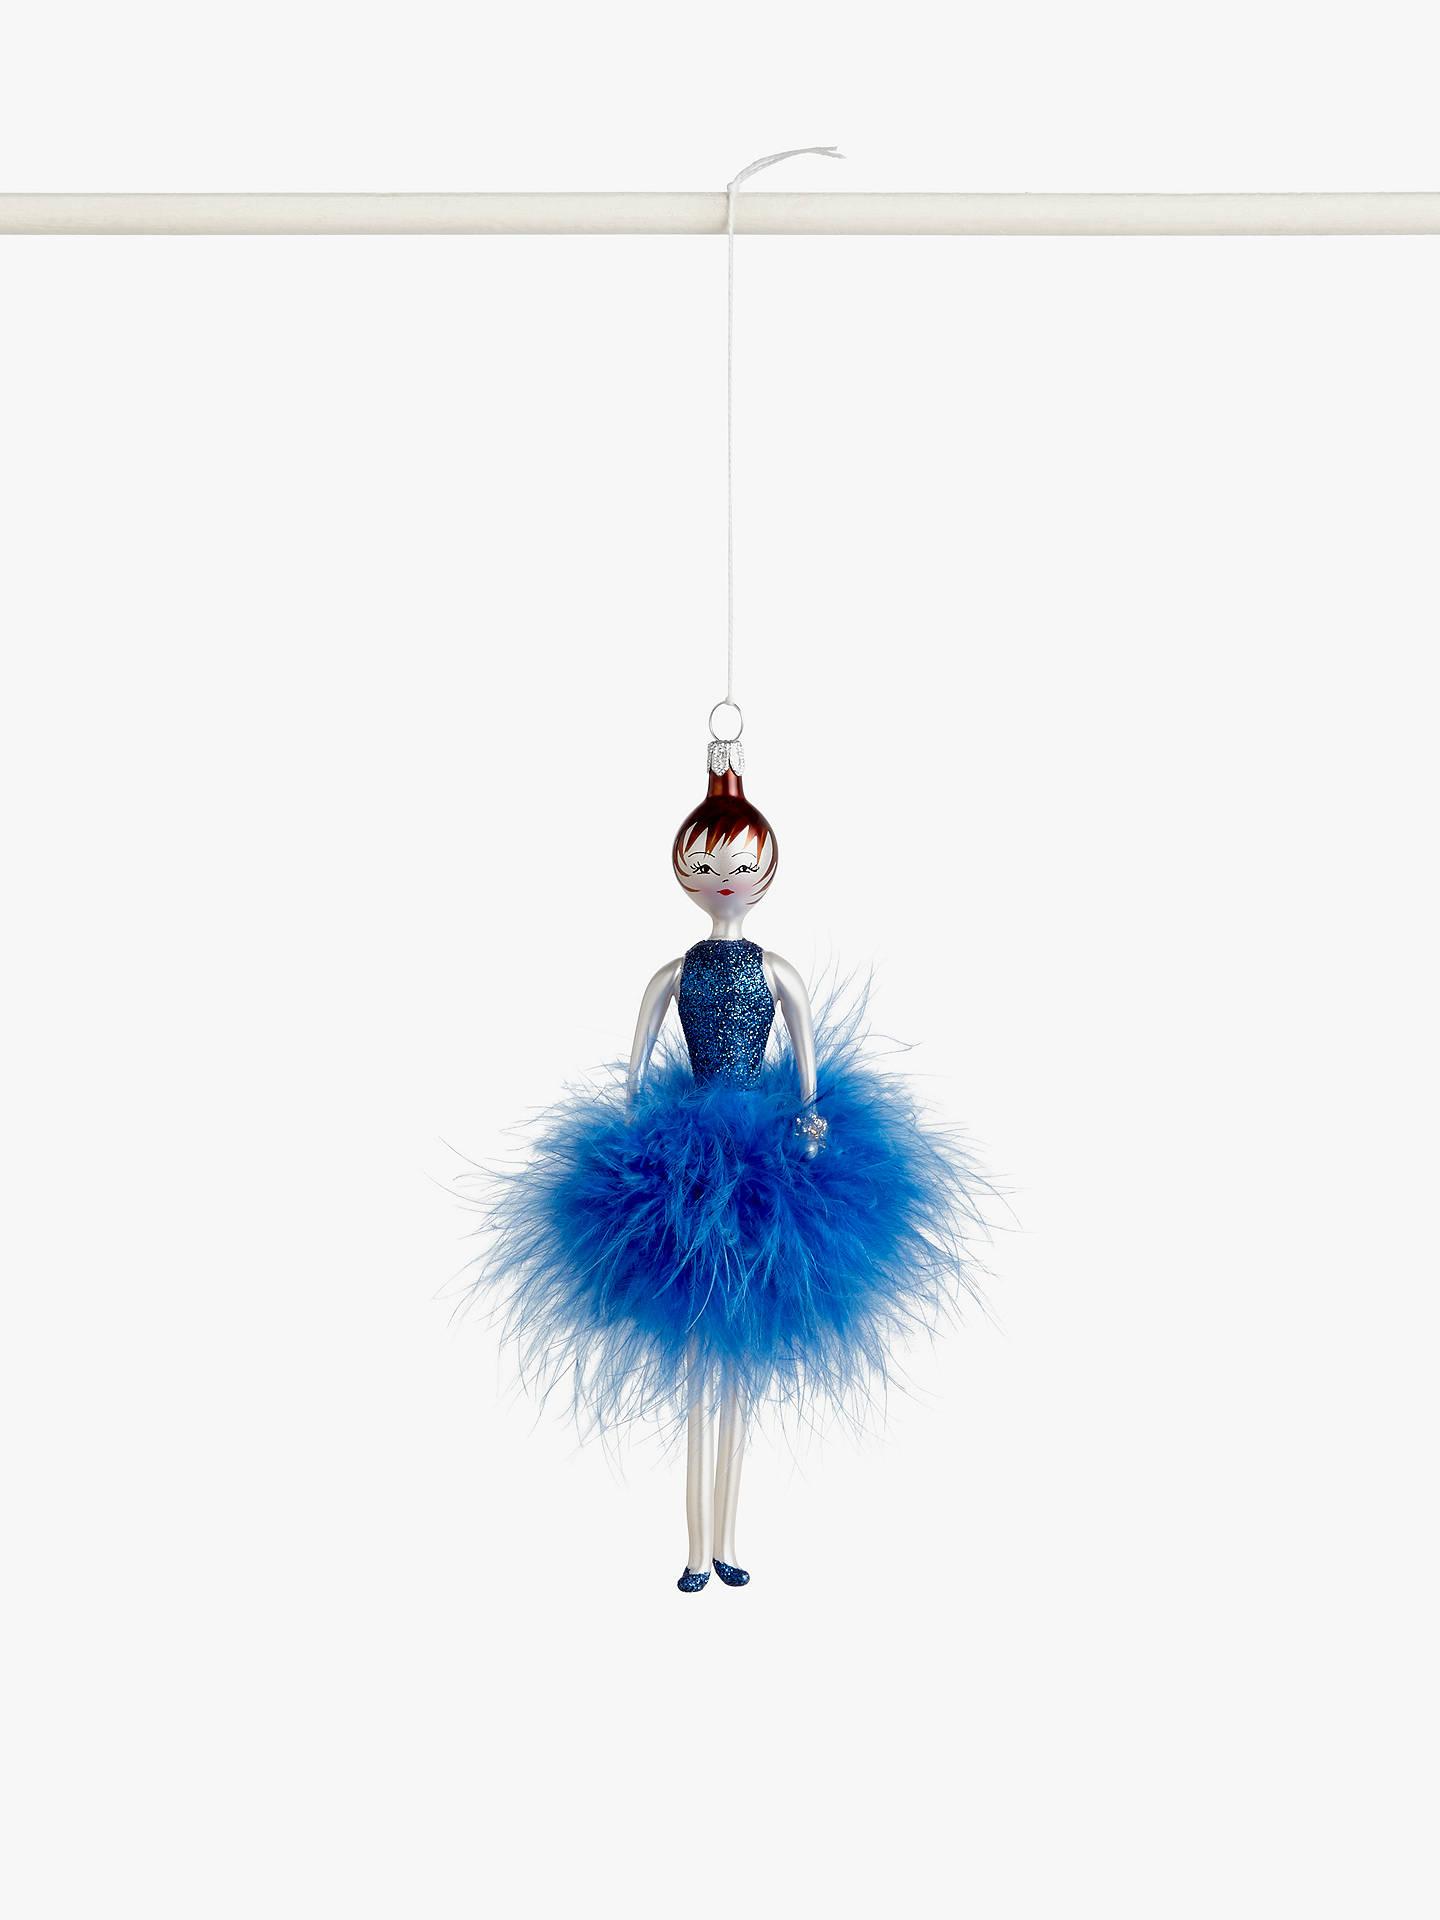 De Carlini Lady Tree Decoration, Blue Dress by De Carlini